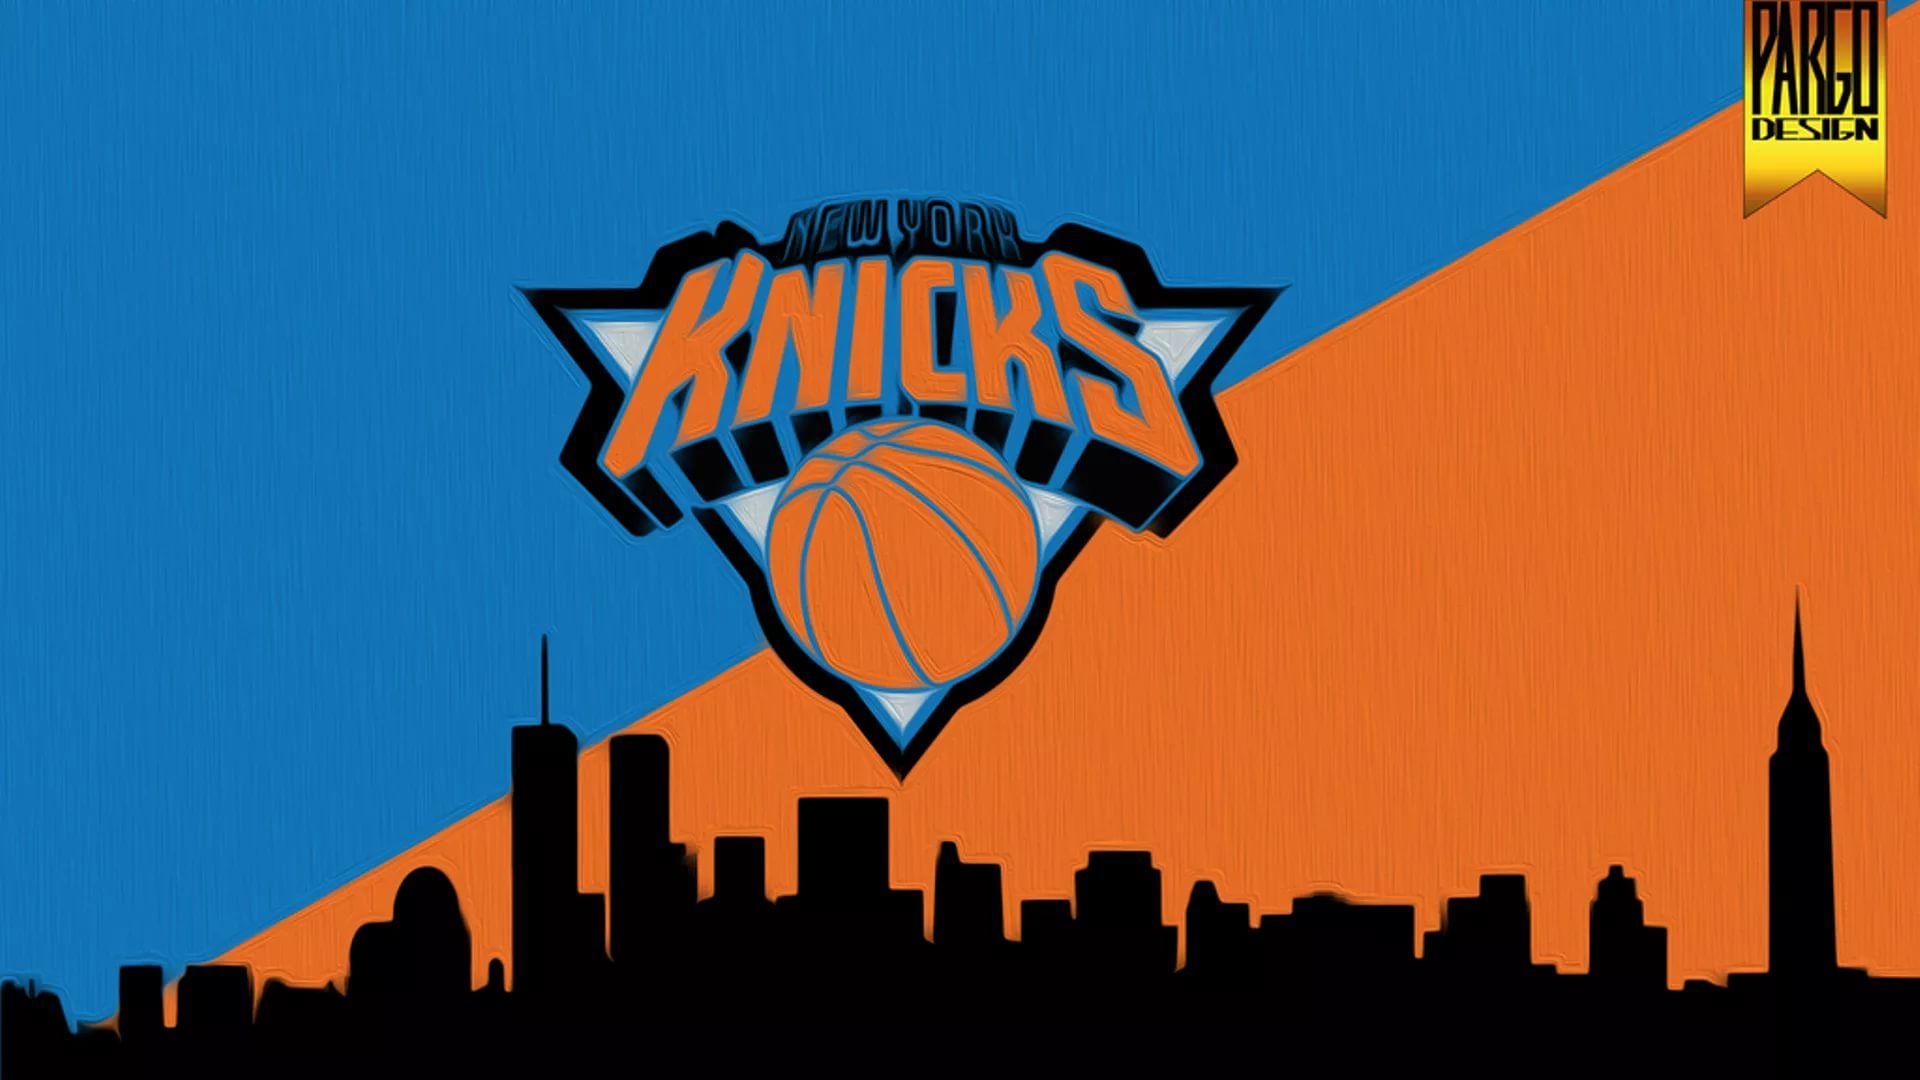 New York Knicks Cool Wallpaper